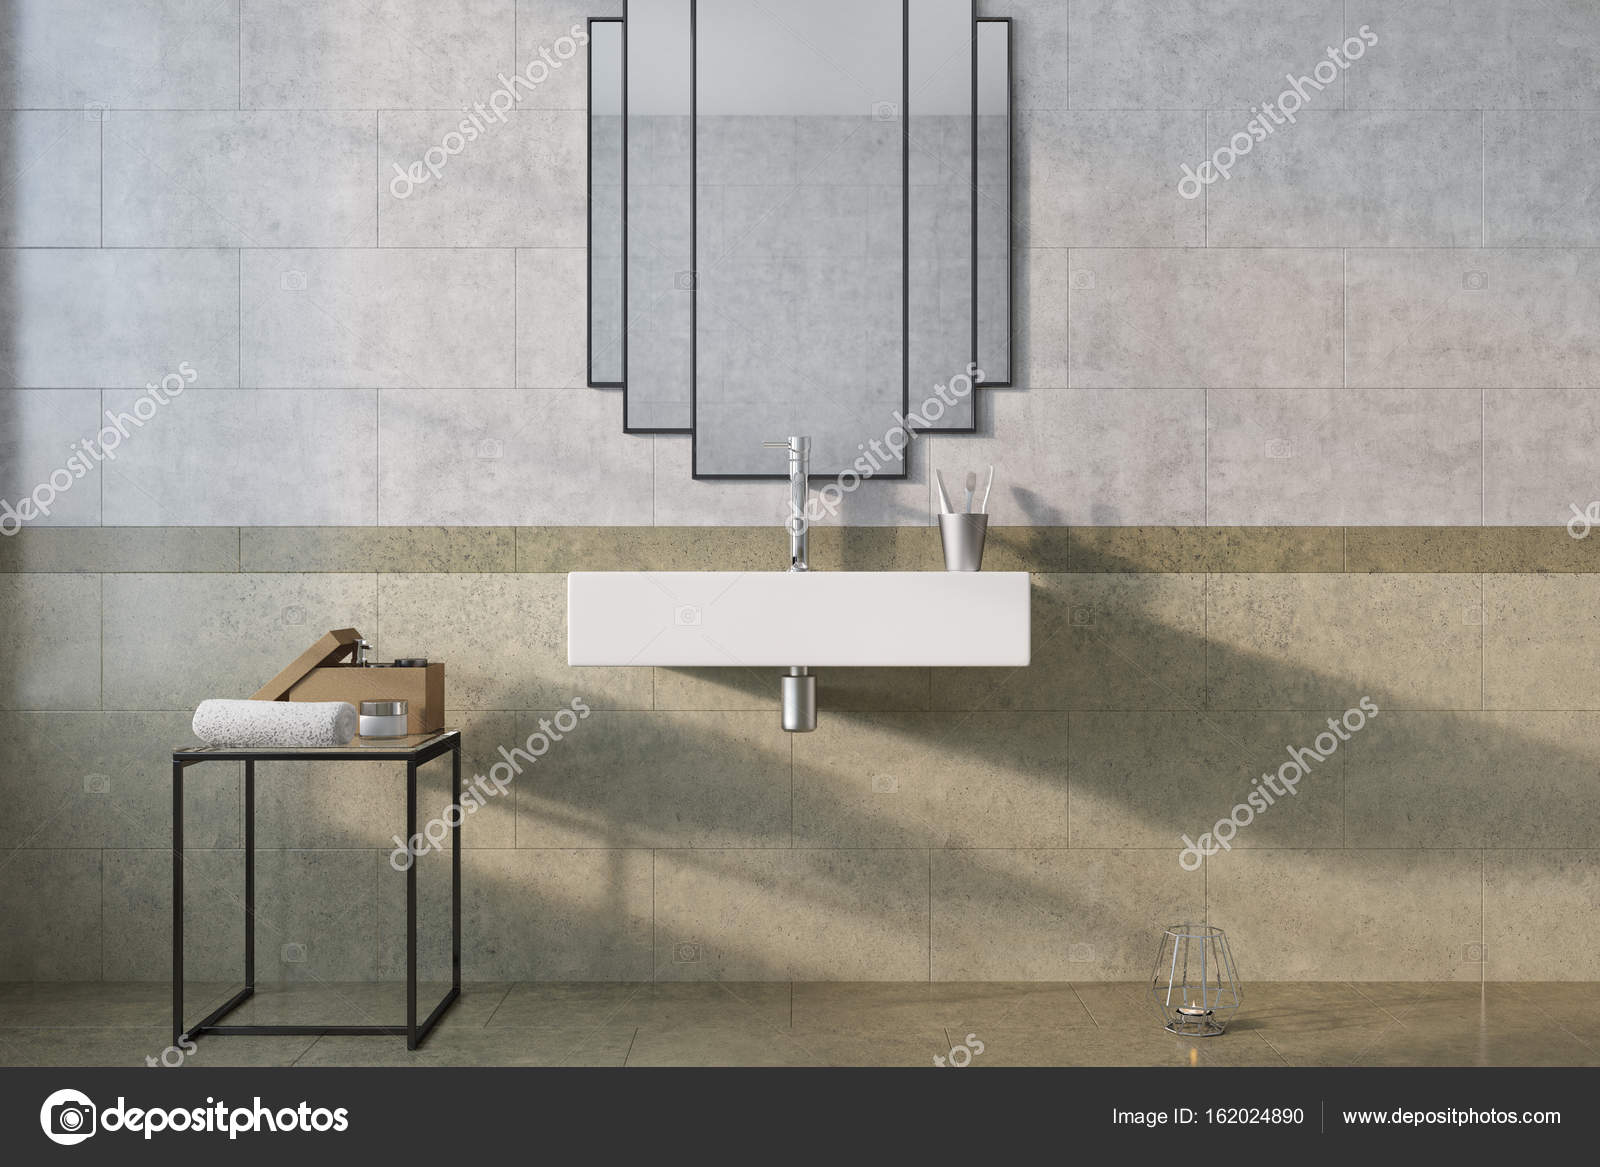 Vintage Badkamer Spiegel : Originele spiegel marmeren badkamer wastafel u2014 stockfoto